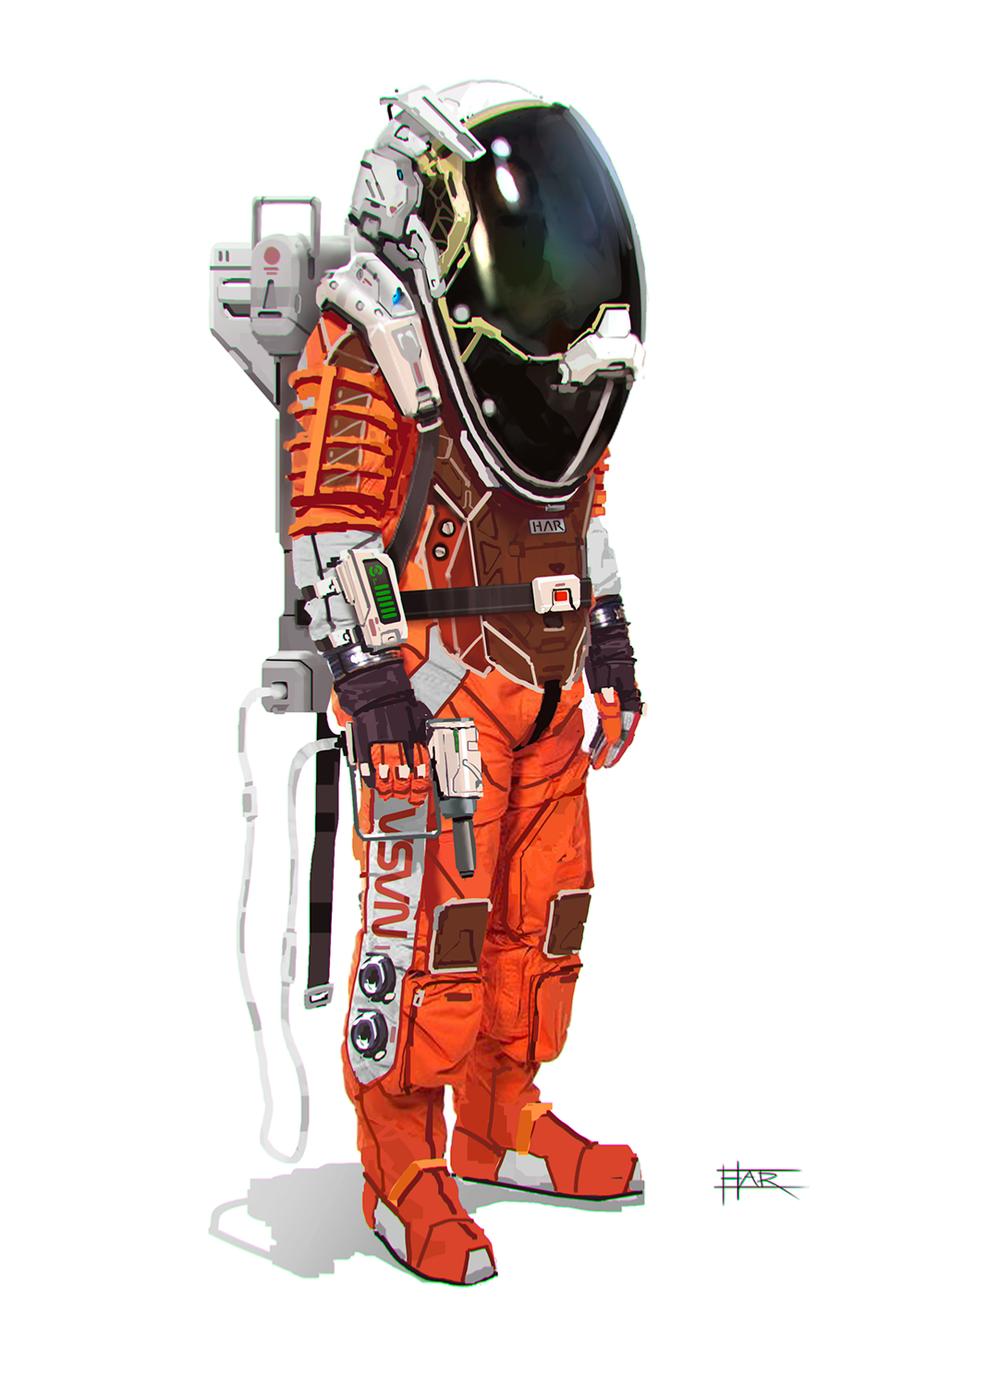 Astronaut Orbital Engineer